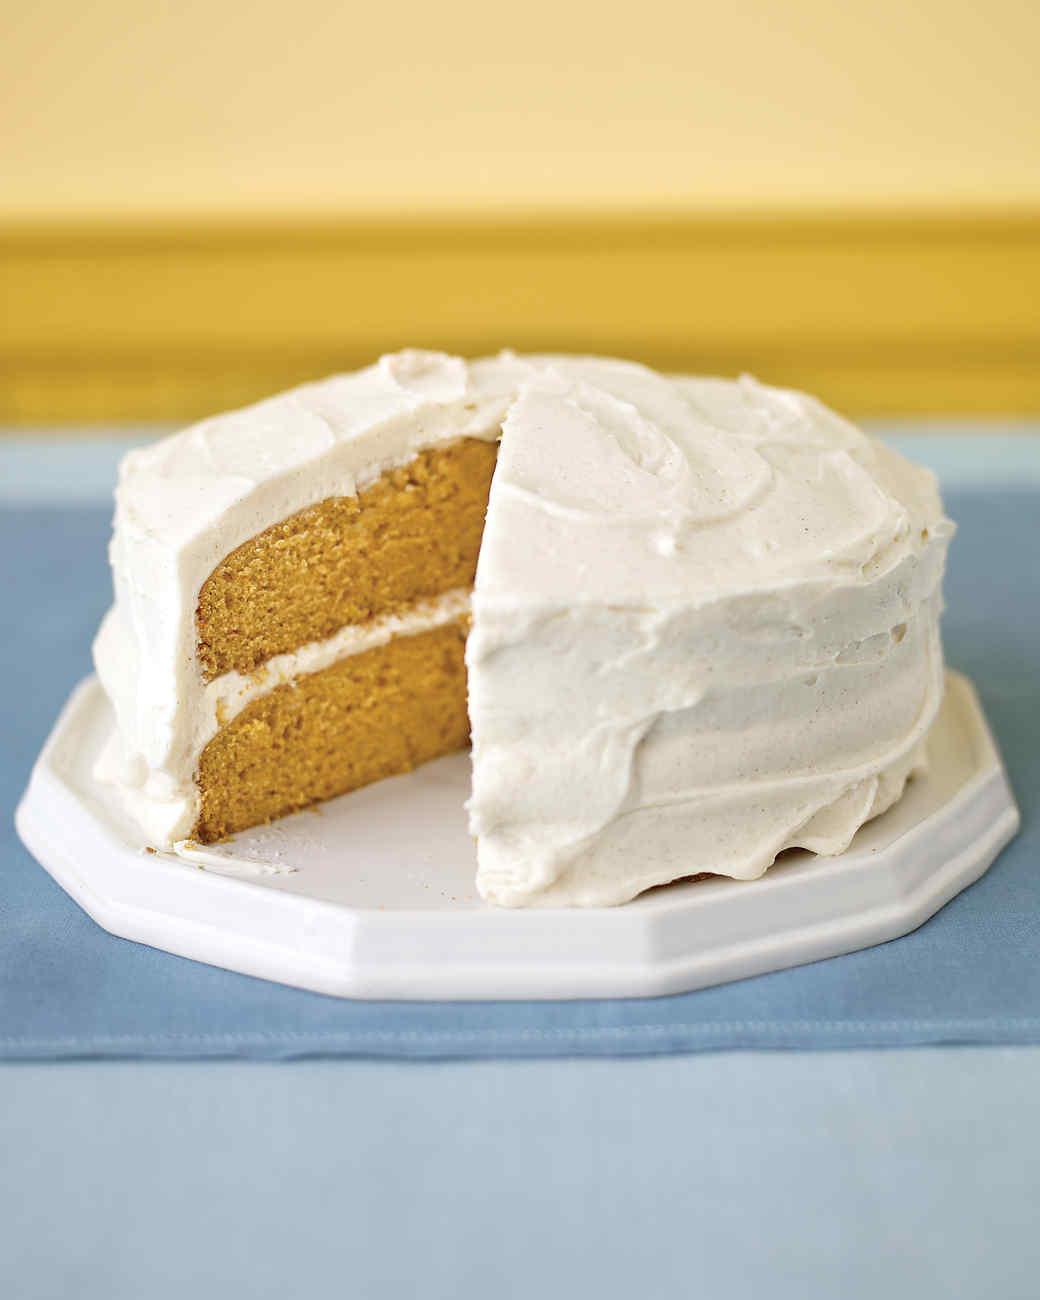 pumpkin-layer-cake-1107-med103255.jpg